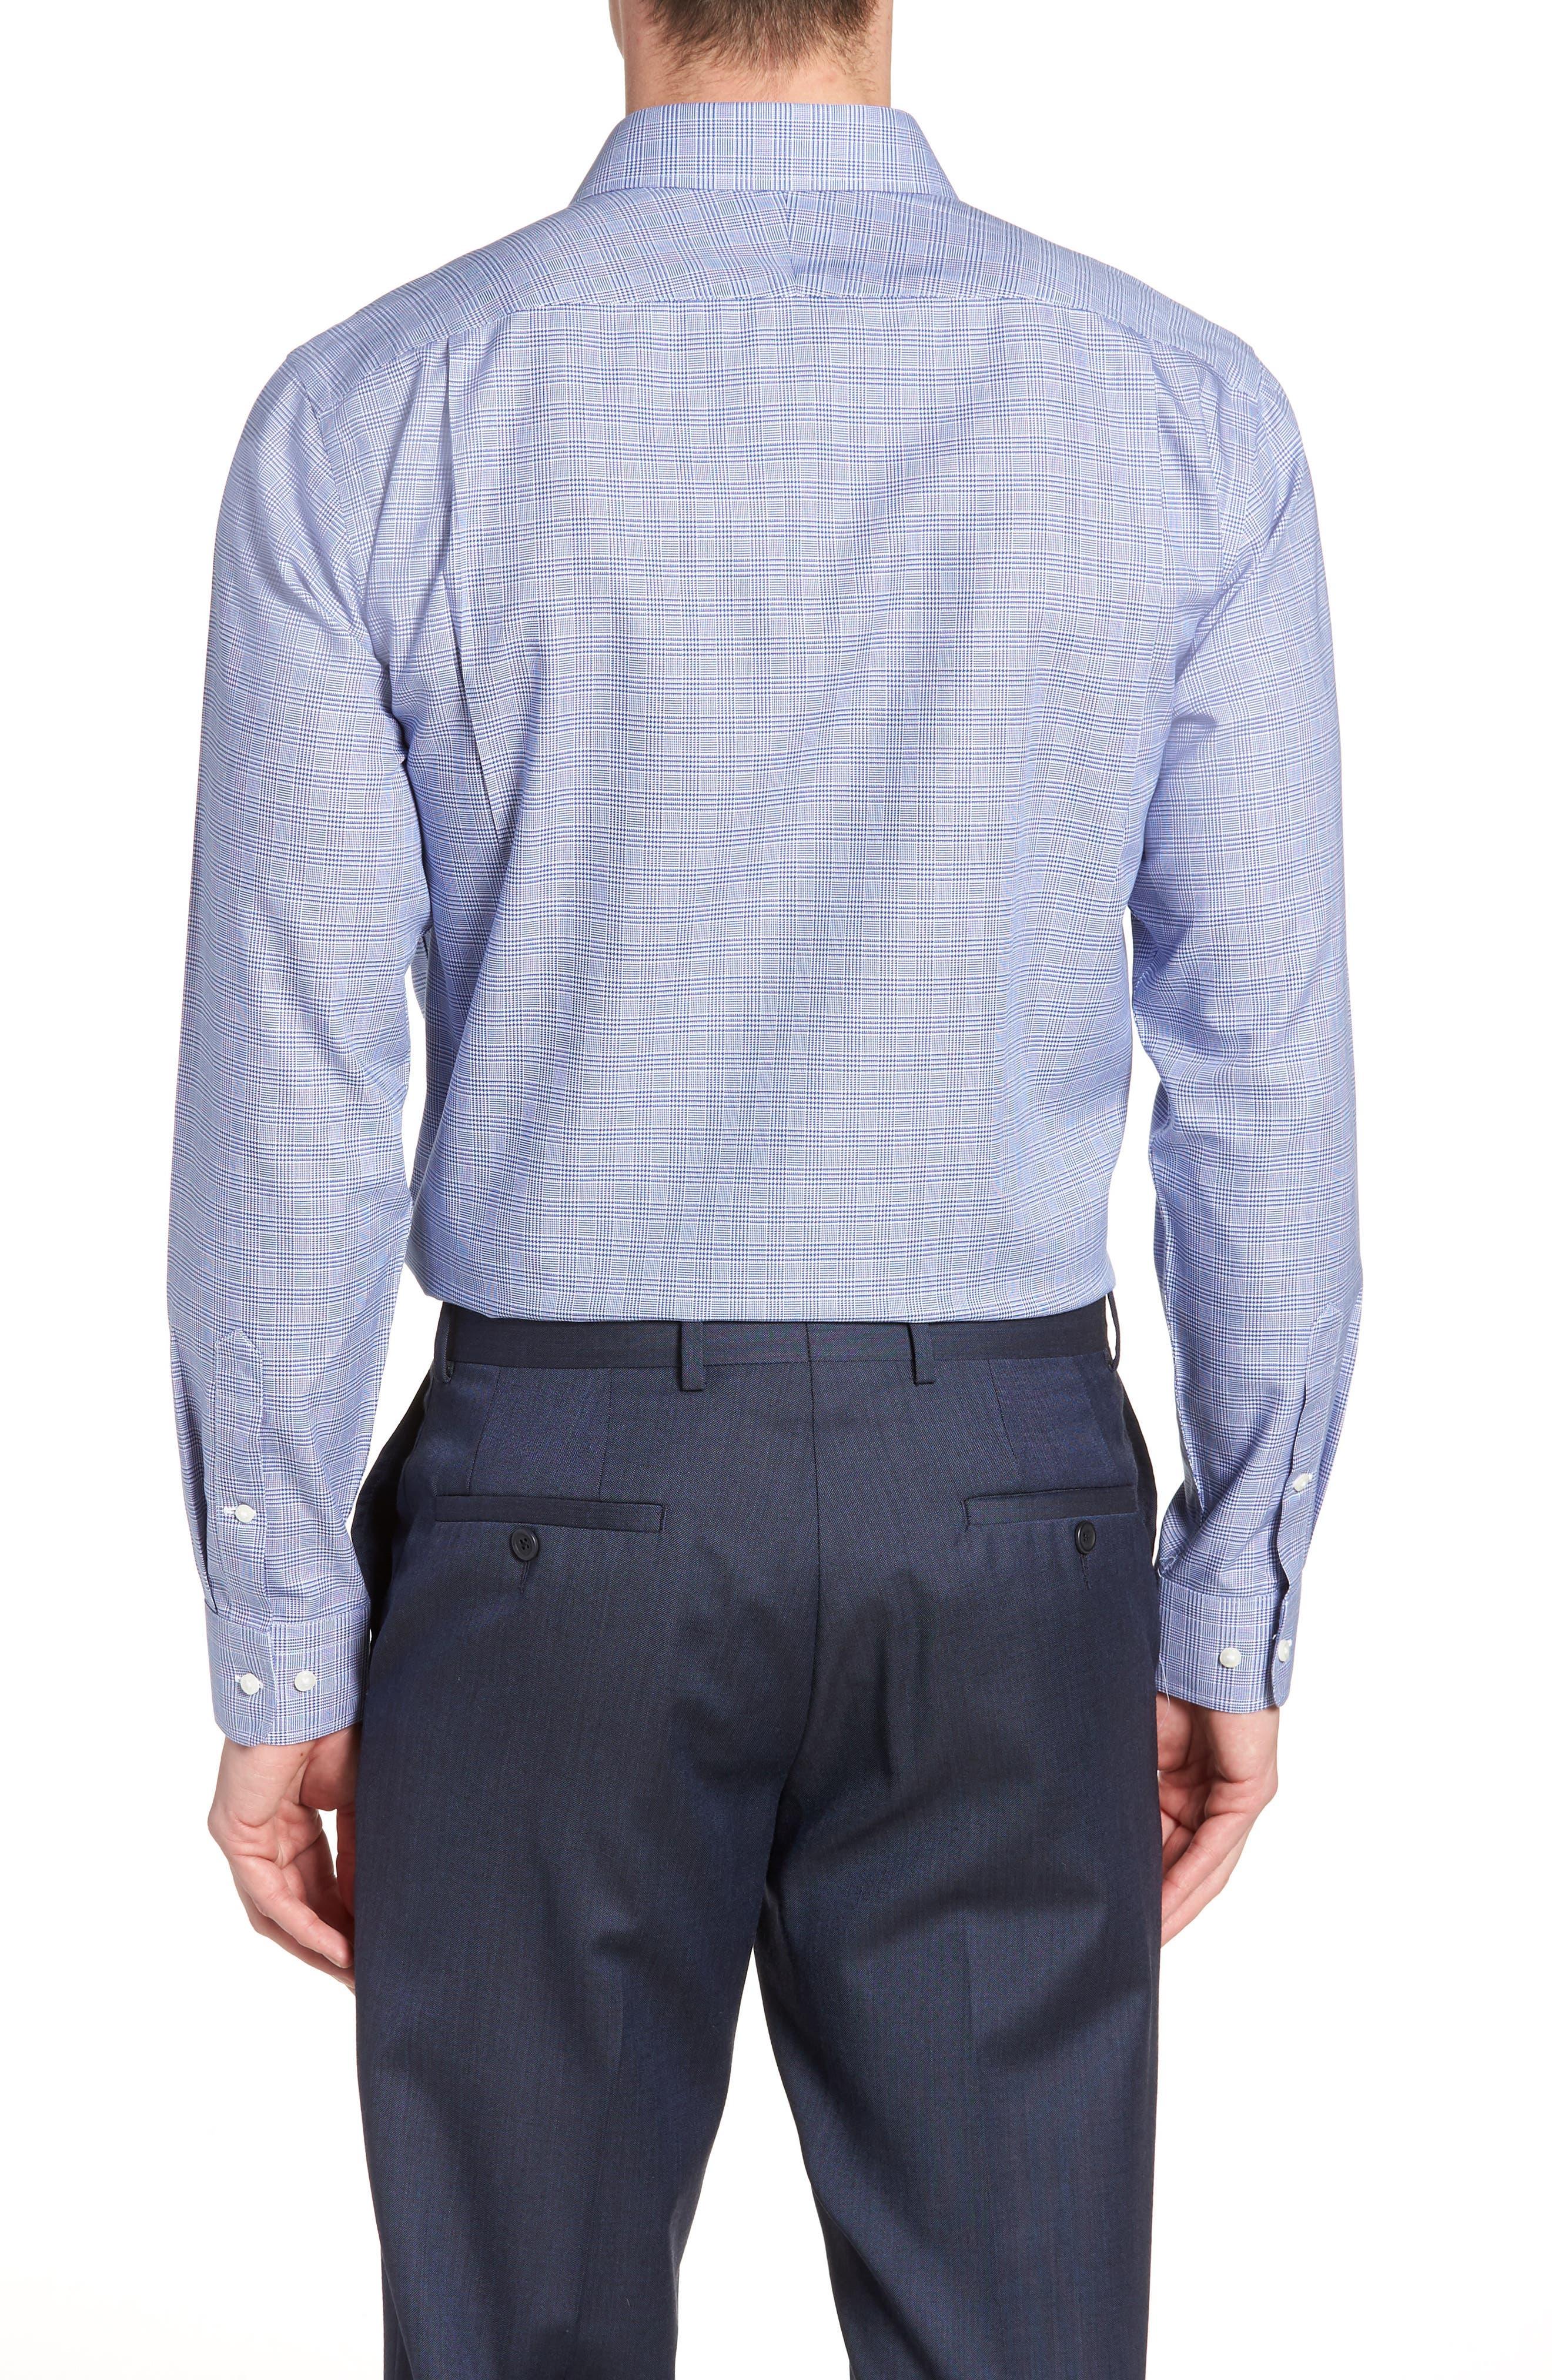 Smartcare<sup>™</sup> Trim Fit Herringbone Dress Shirt,                             Alternate thumbnail 3, color,                             Blue Marine